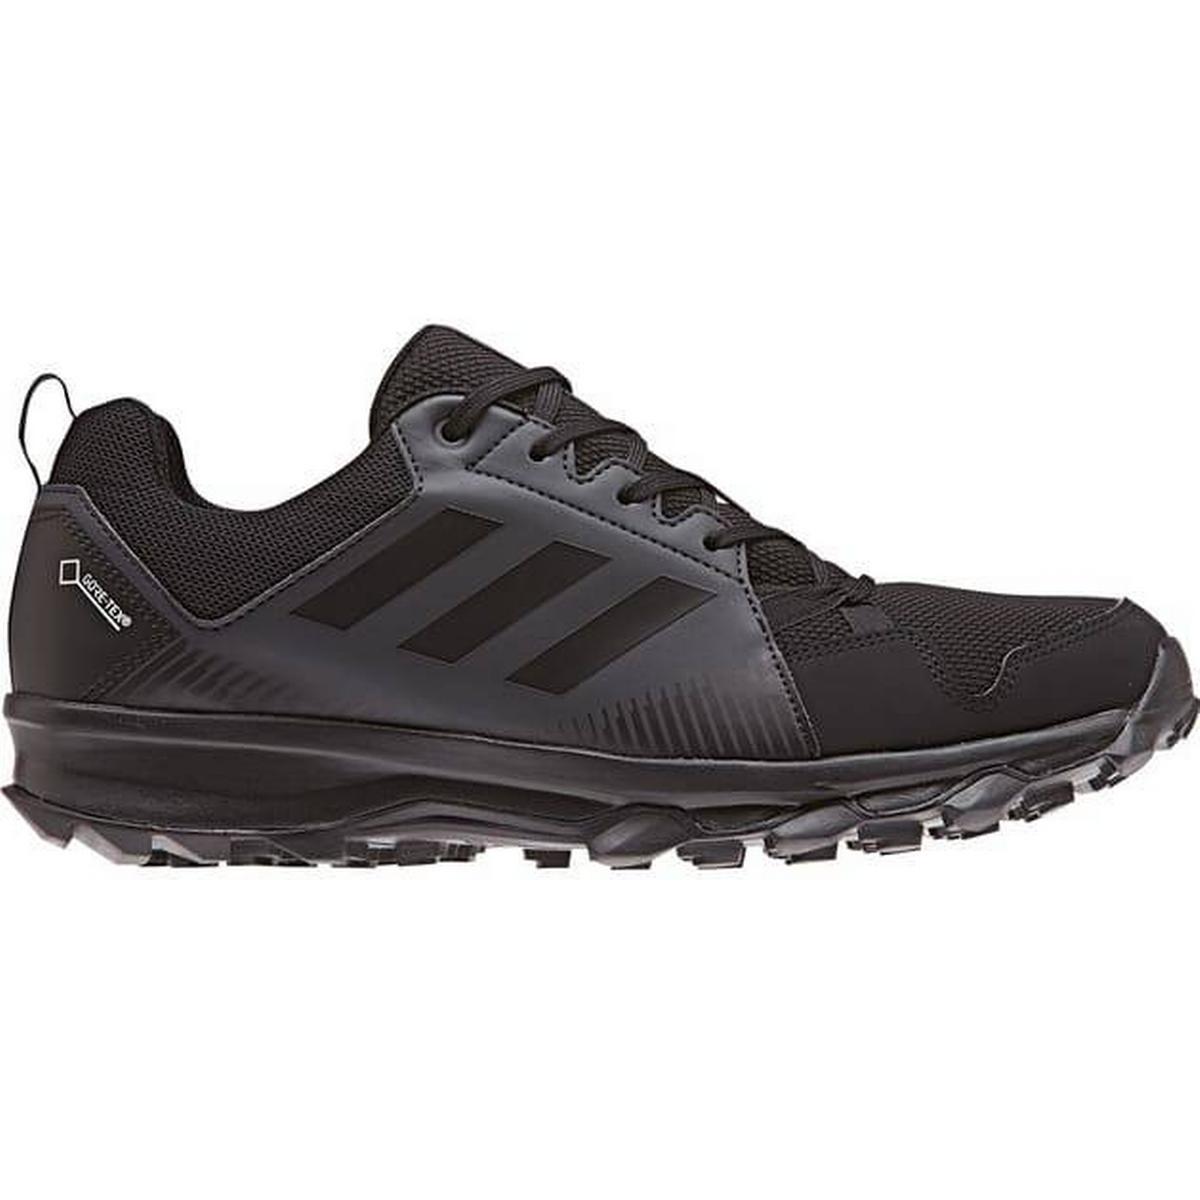 Gore tex skor dam adidas • Hitta det lägsta priset hos